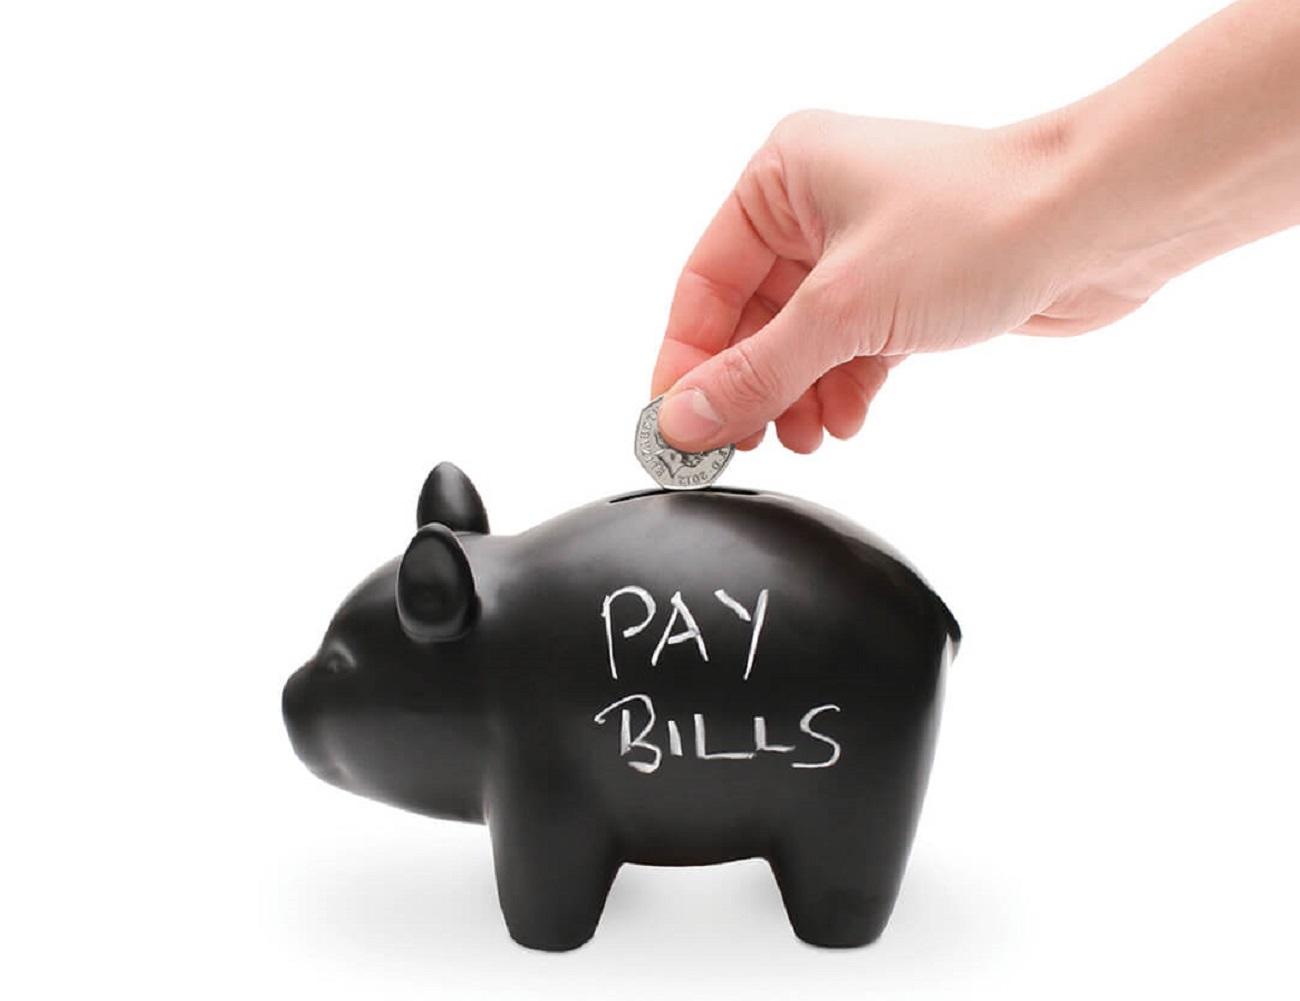 CapitaLIST Pig Chalkboard Piggy Bank